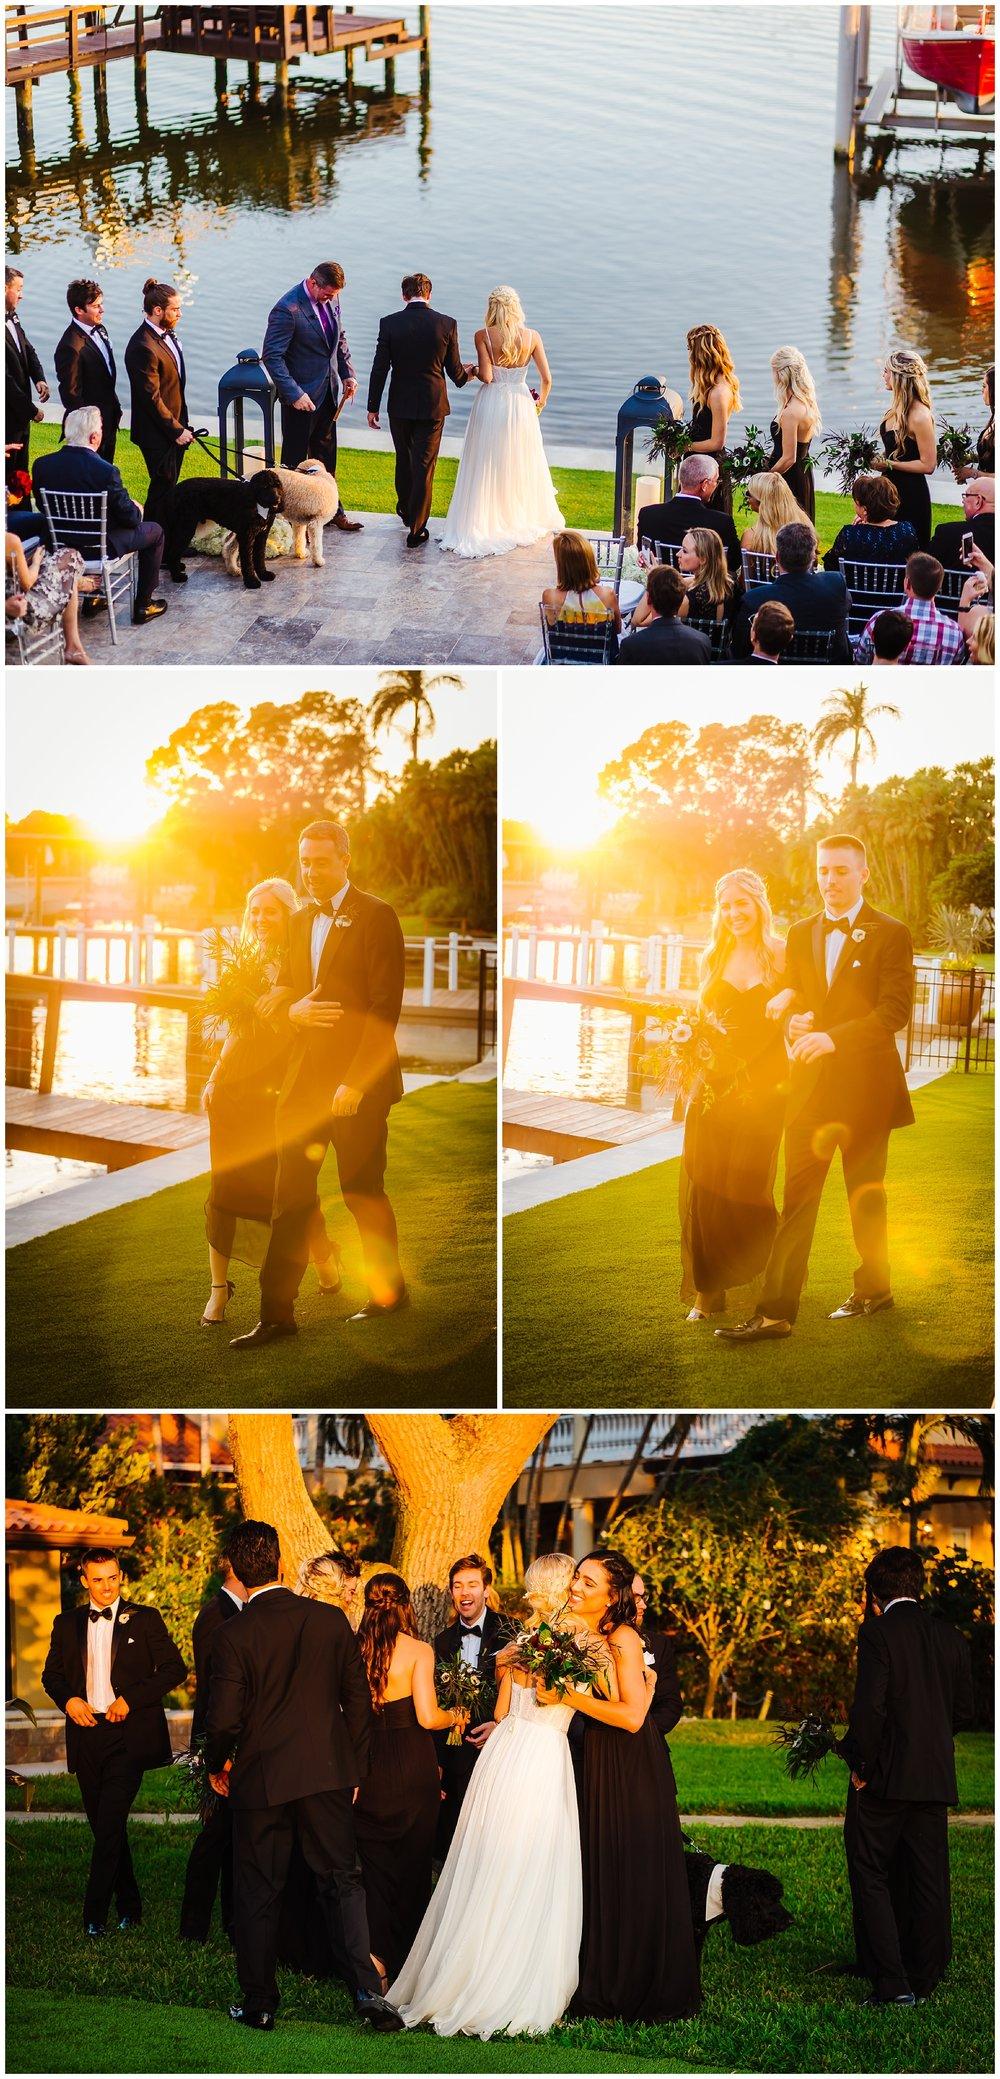 st-pete-wedding-photographer-backyard-luxury-snell-isle-vinoy_0043.jpg